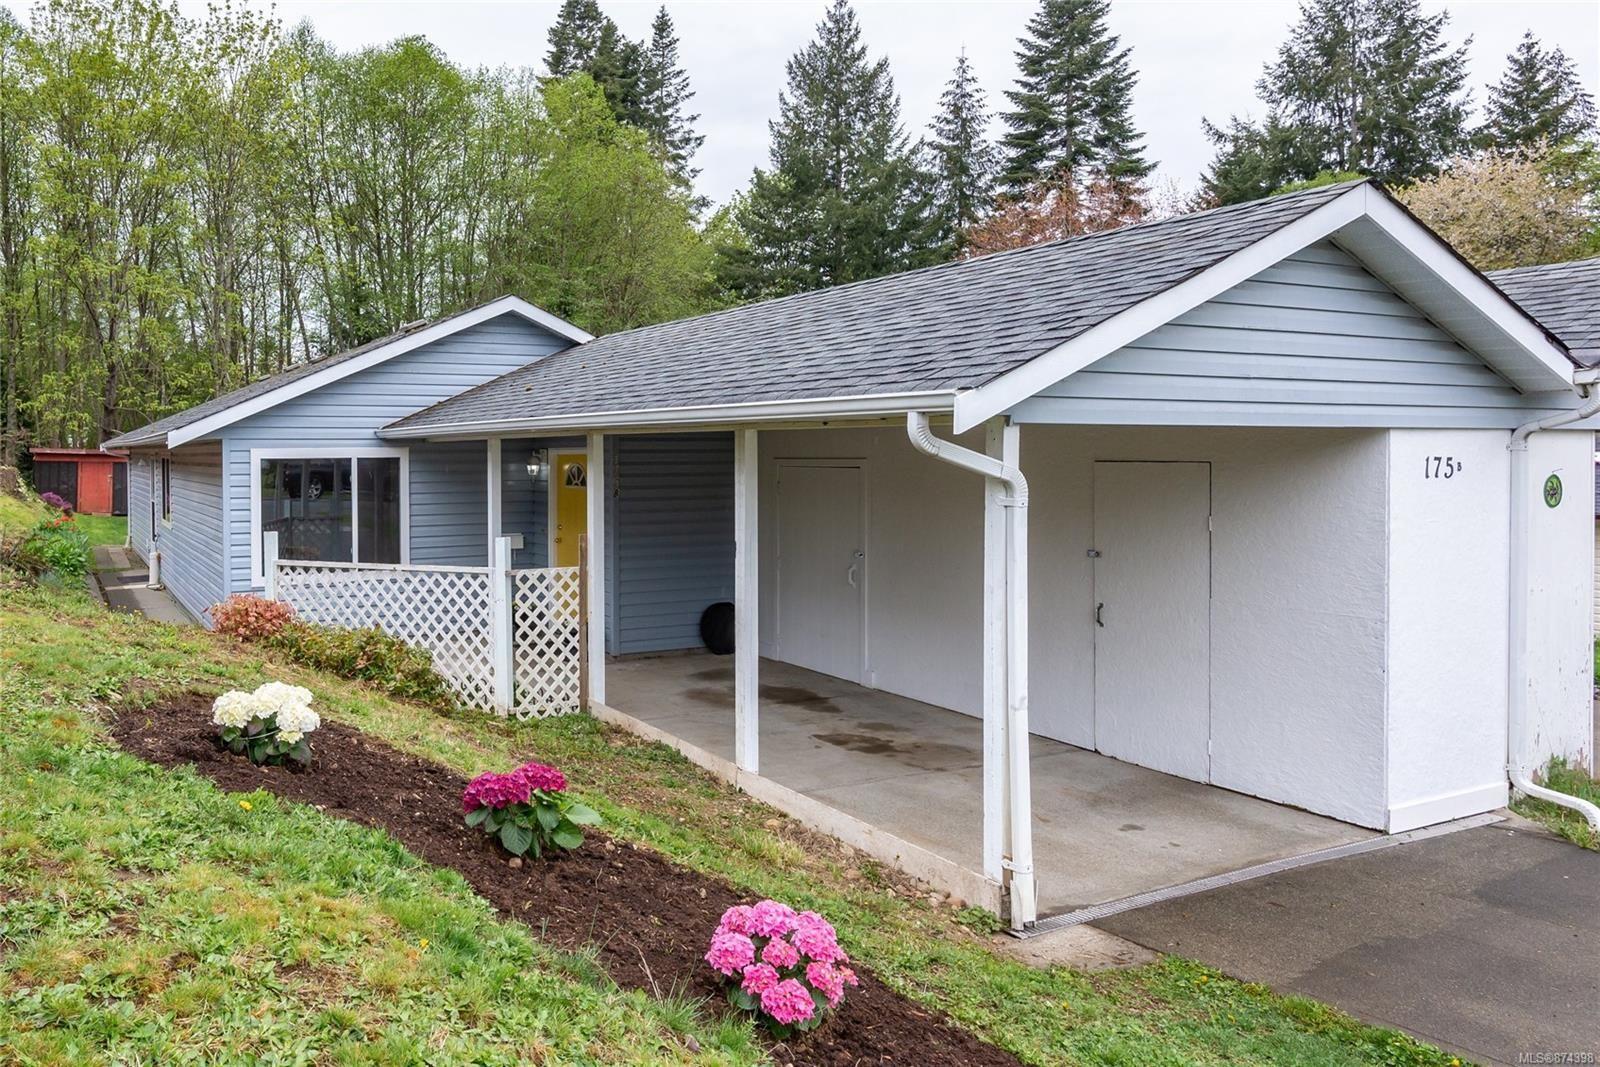 Main Photo: B 175 Willemar Ave in : CV Courtenay City Half Duplex for sale (Comox Valley)  : MLS®# 874398